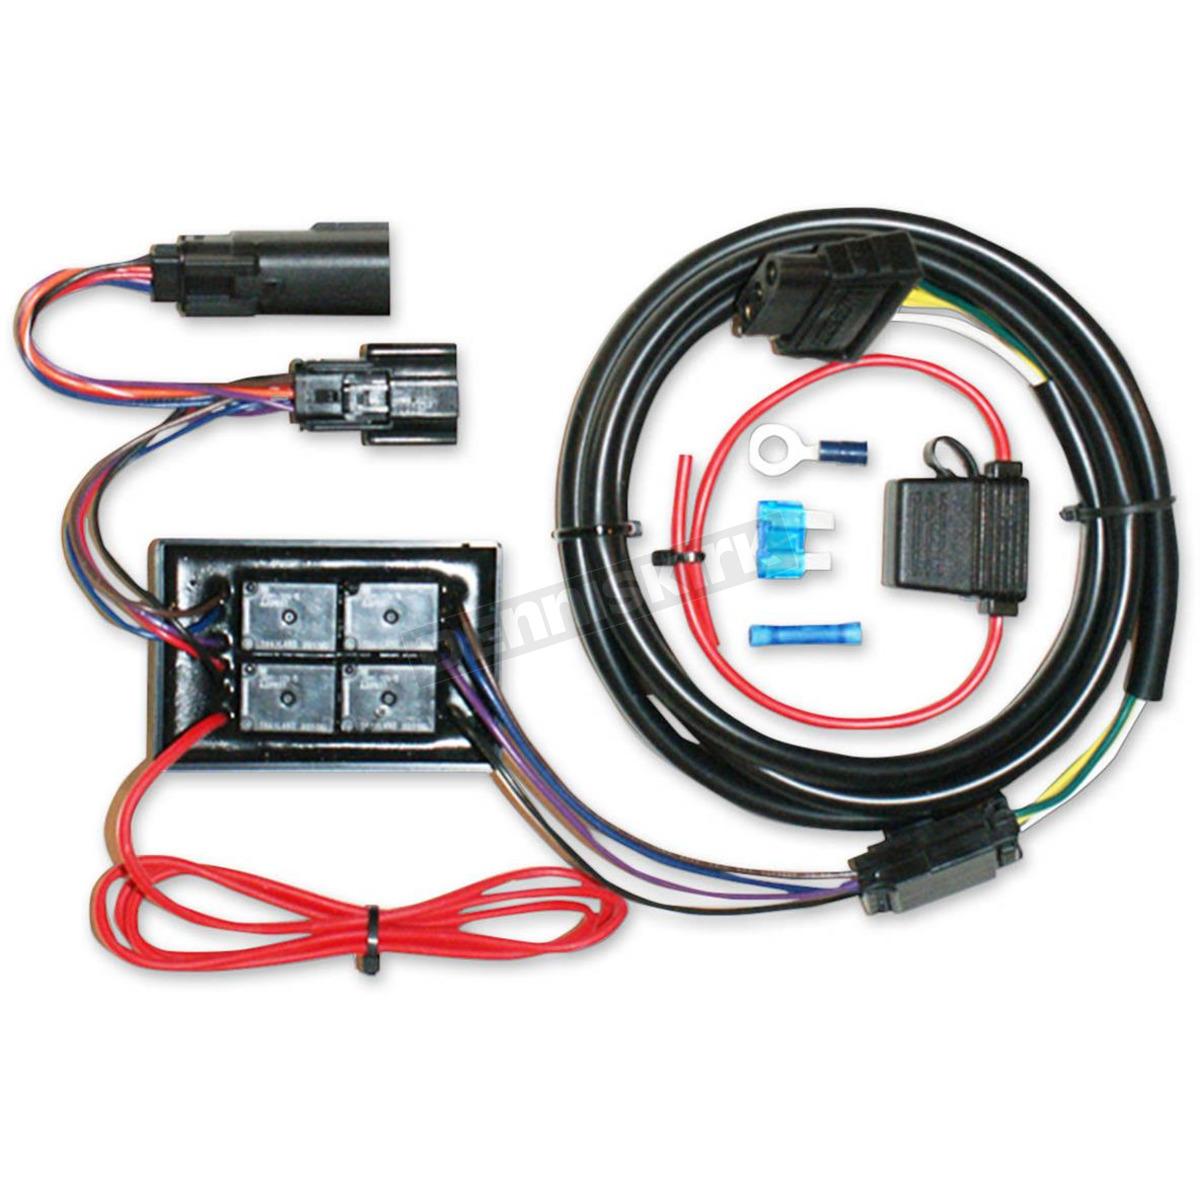 hight resolution of khrome werks plug n play trailer wiring kit 720750